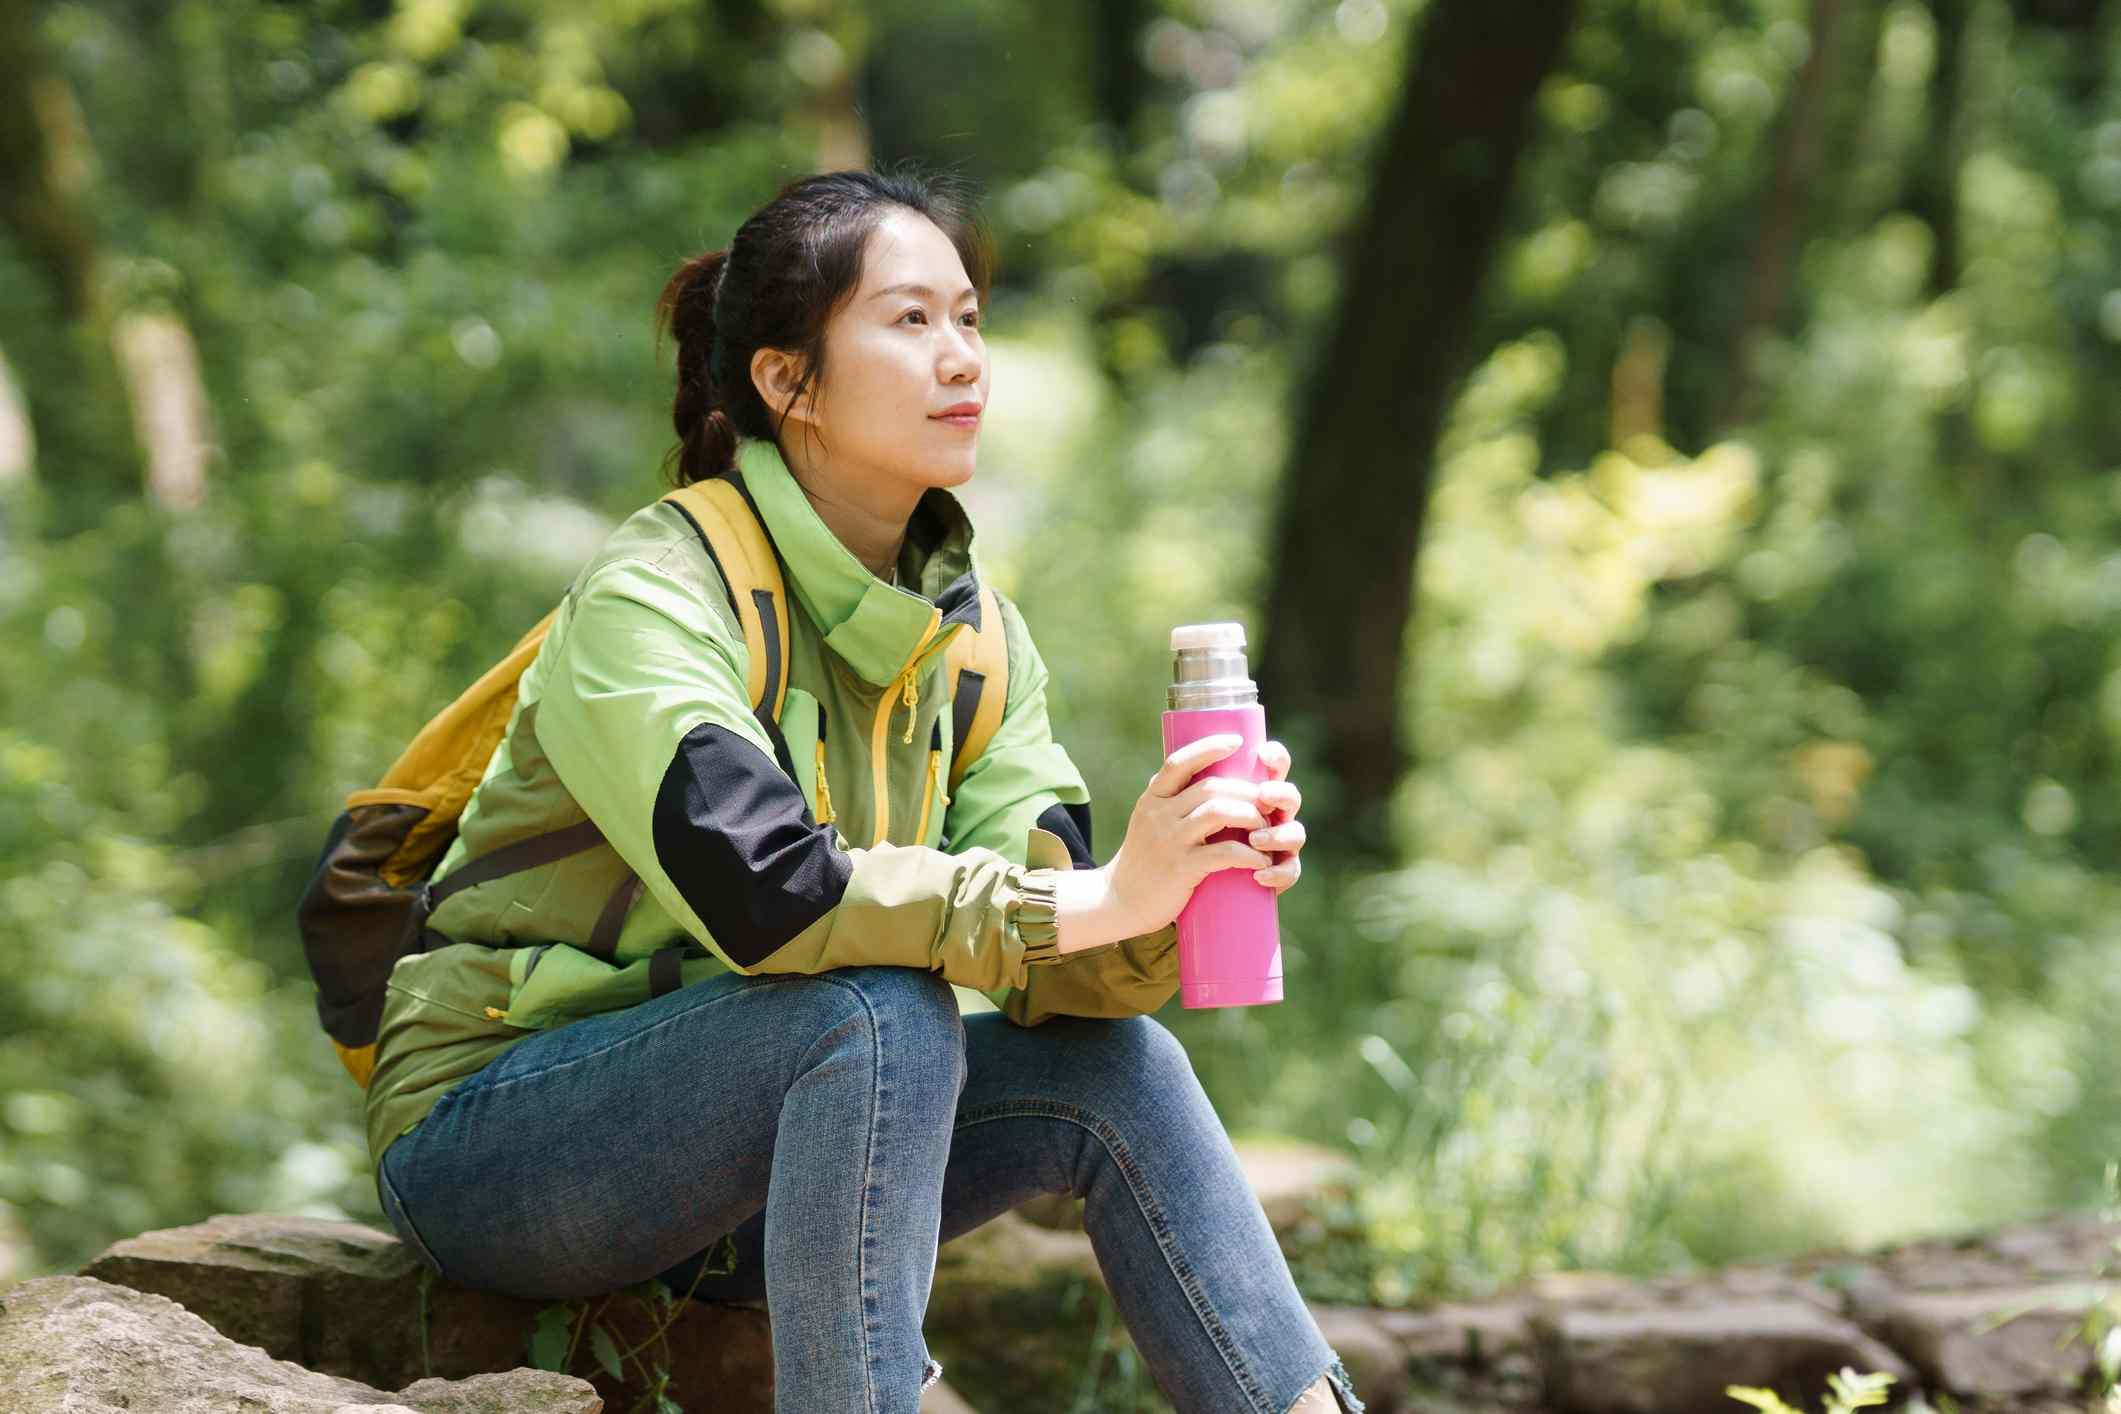 Hiker taking a break with reusable water bottle